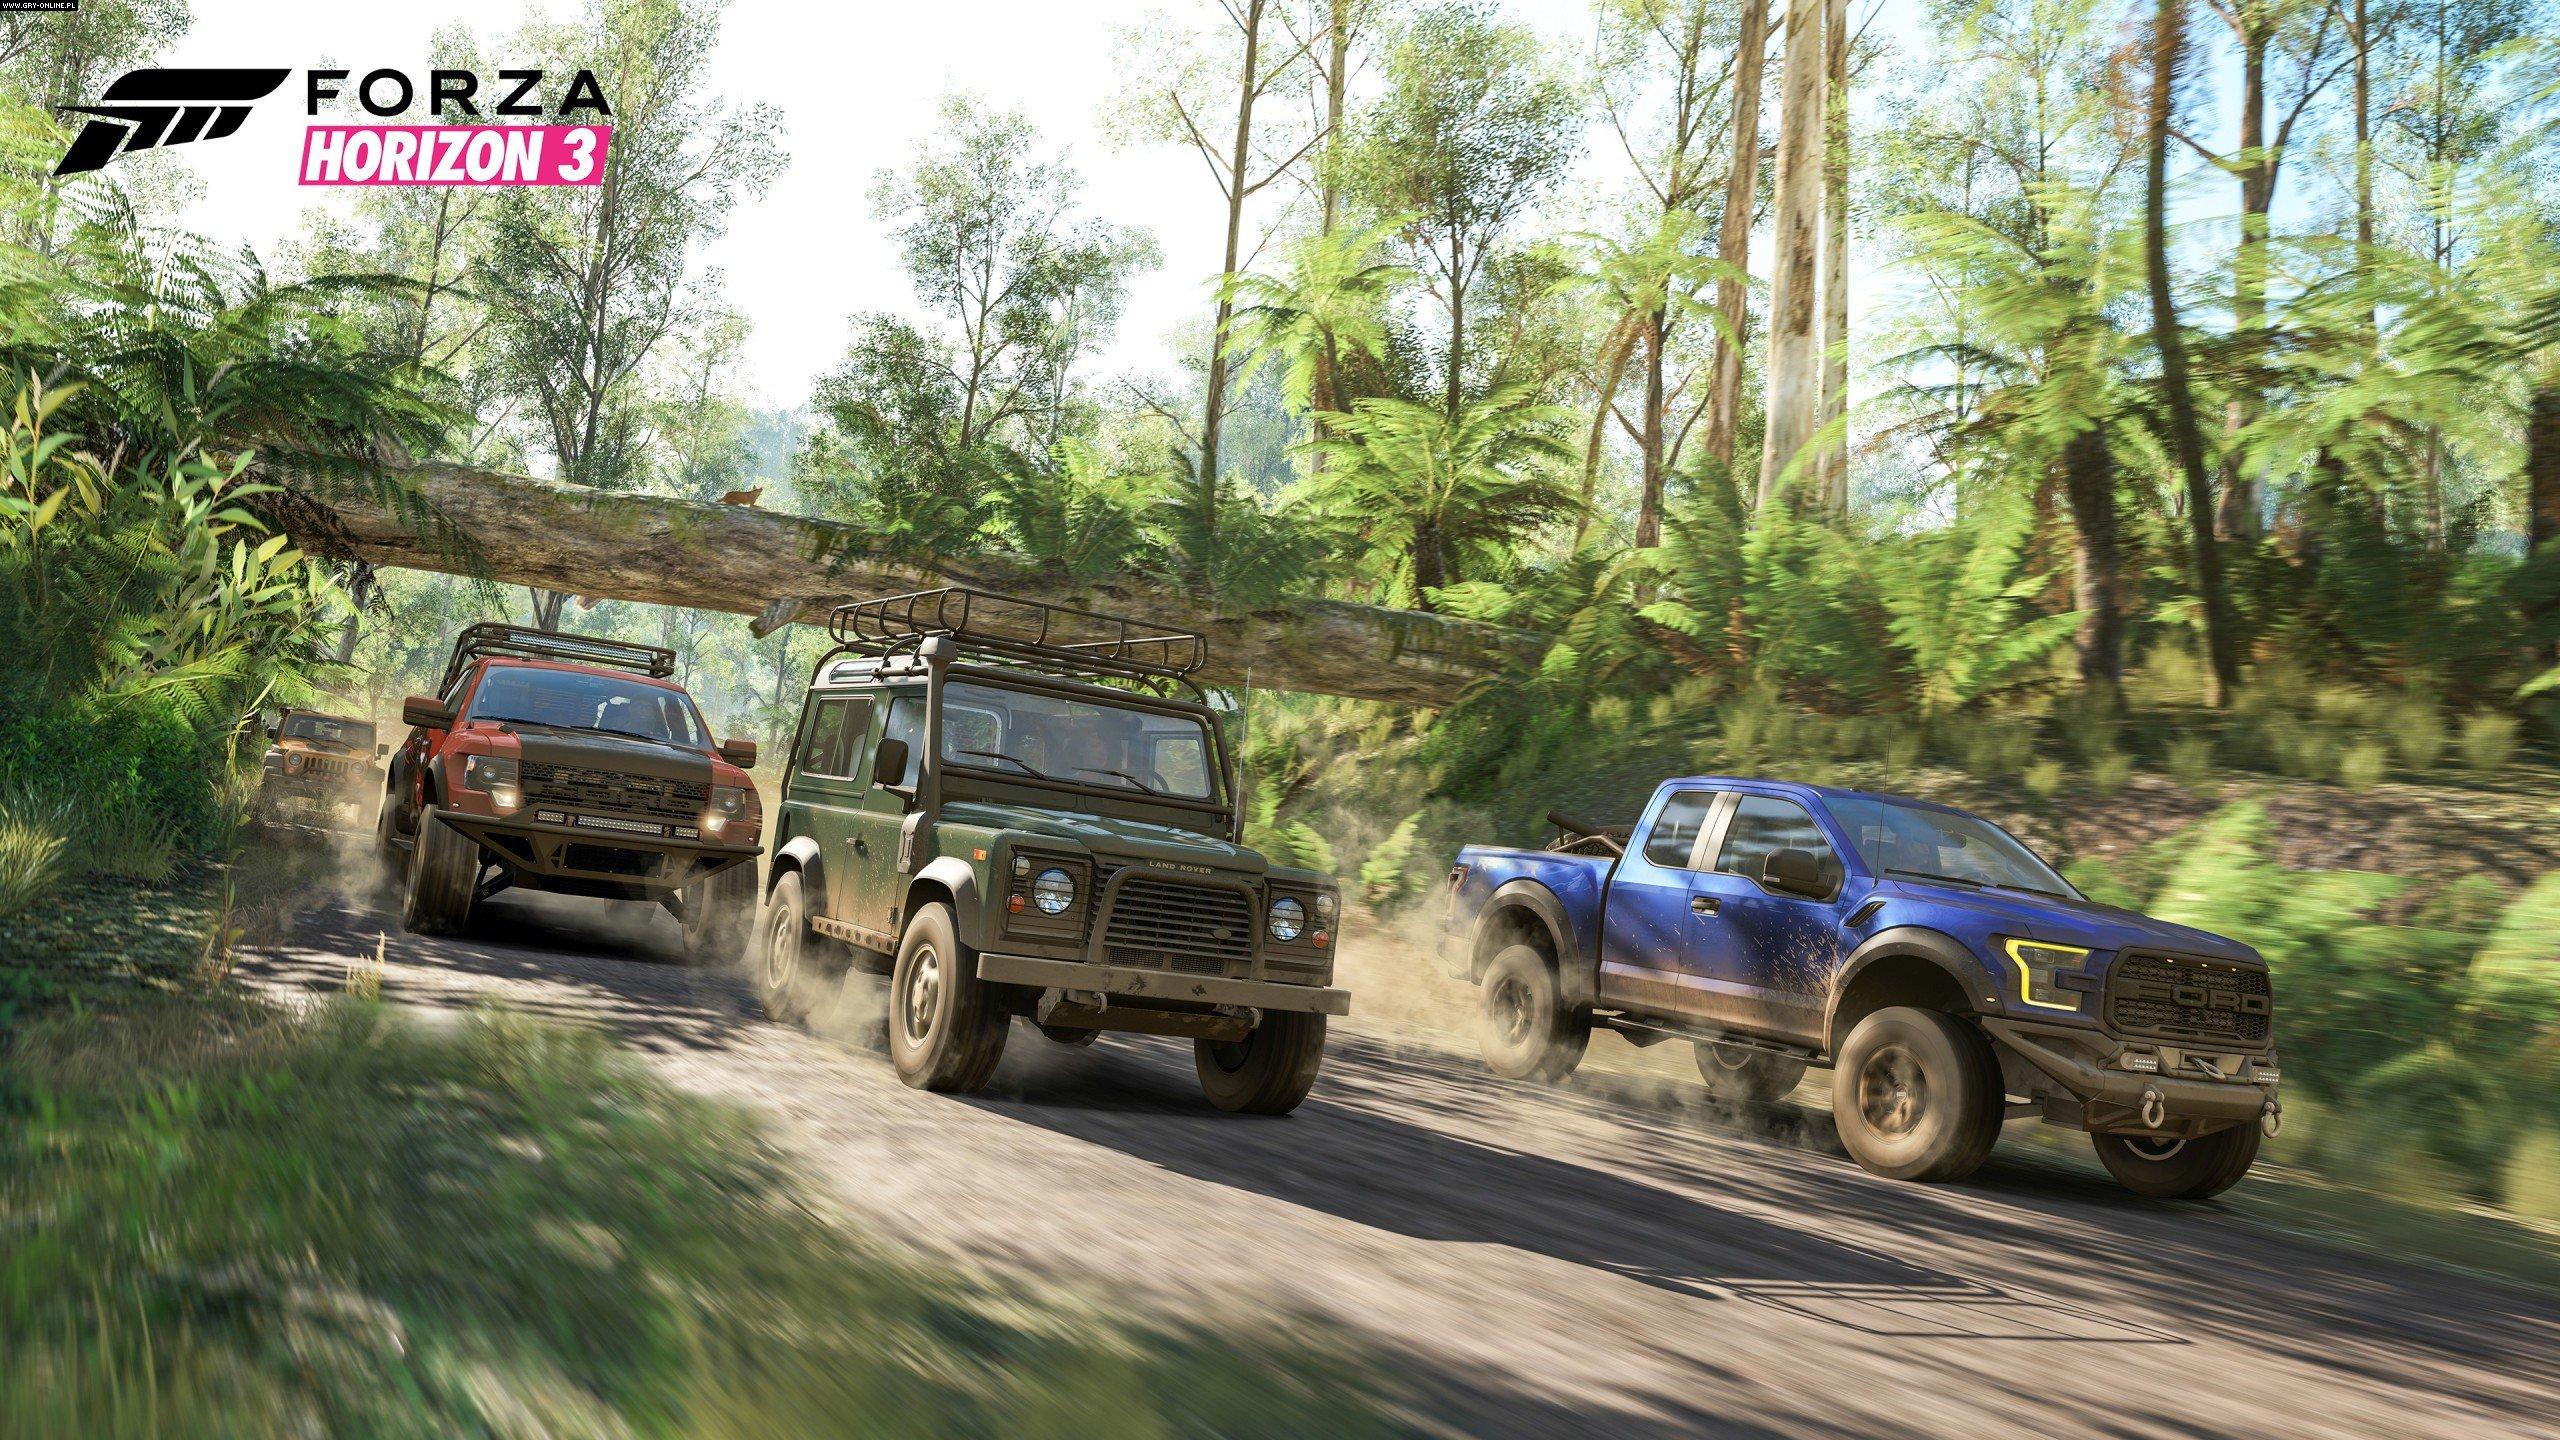 Forza Horizon 3 PC, XONE Games Image 6/11, Playground Games, Microsoft Studios